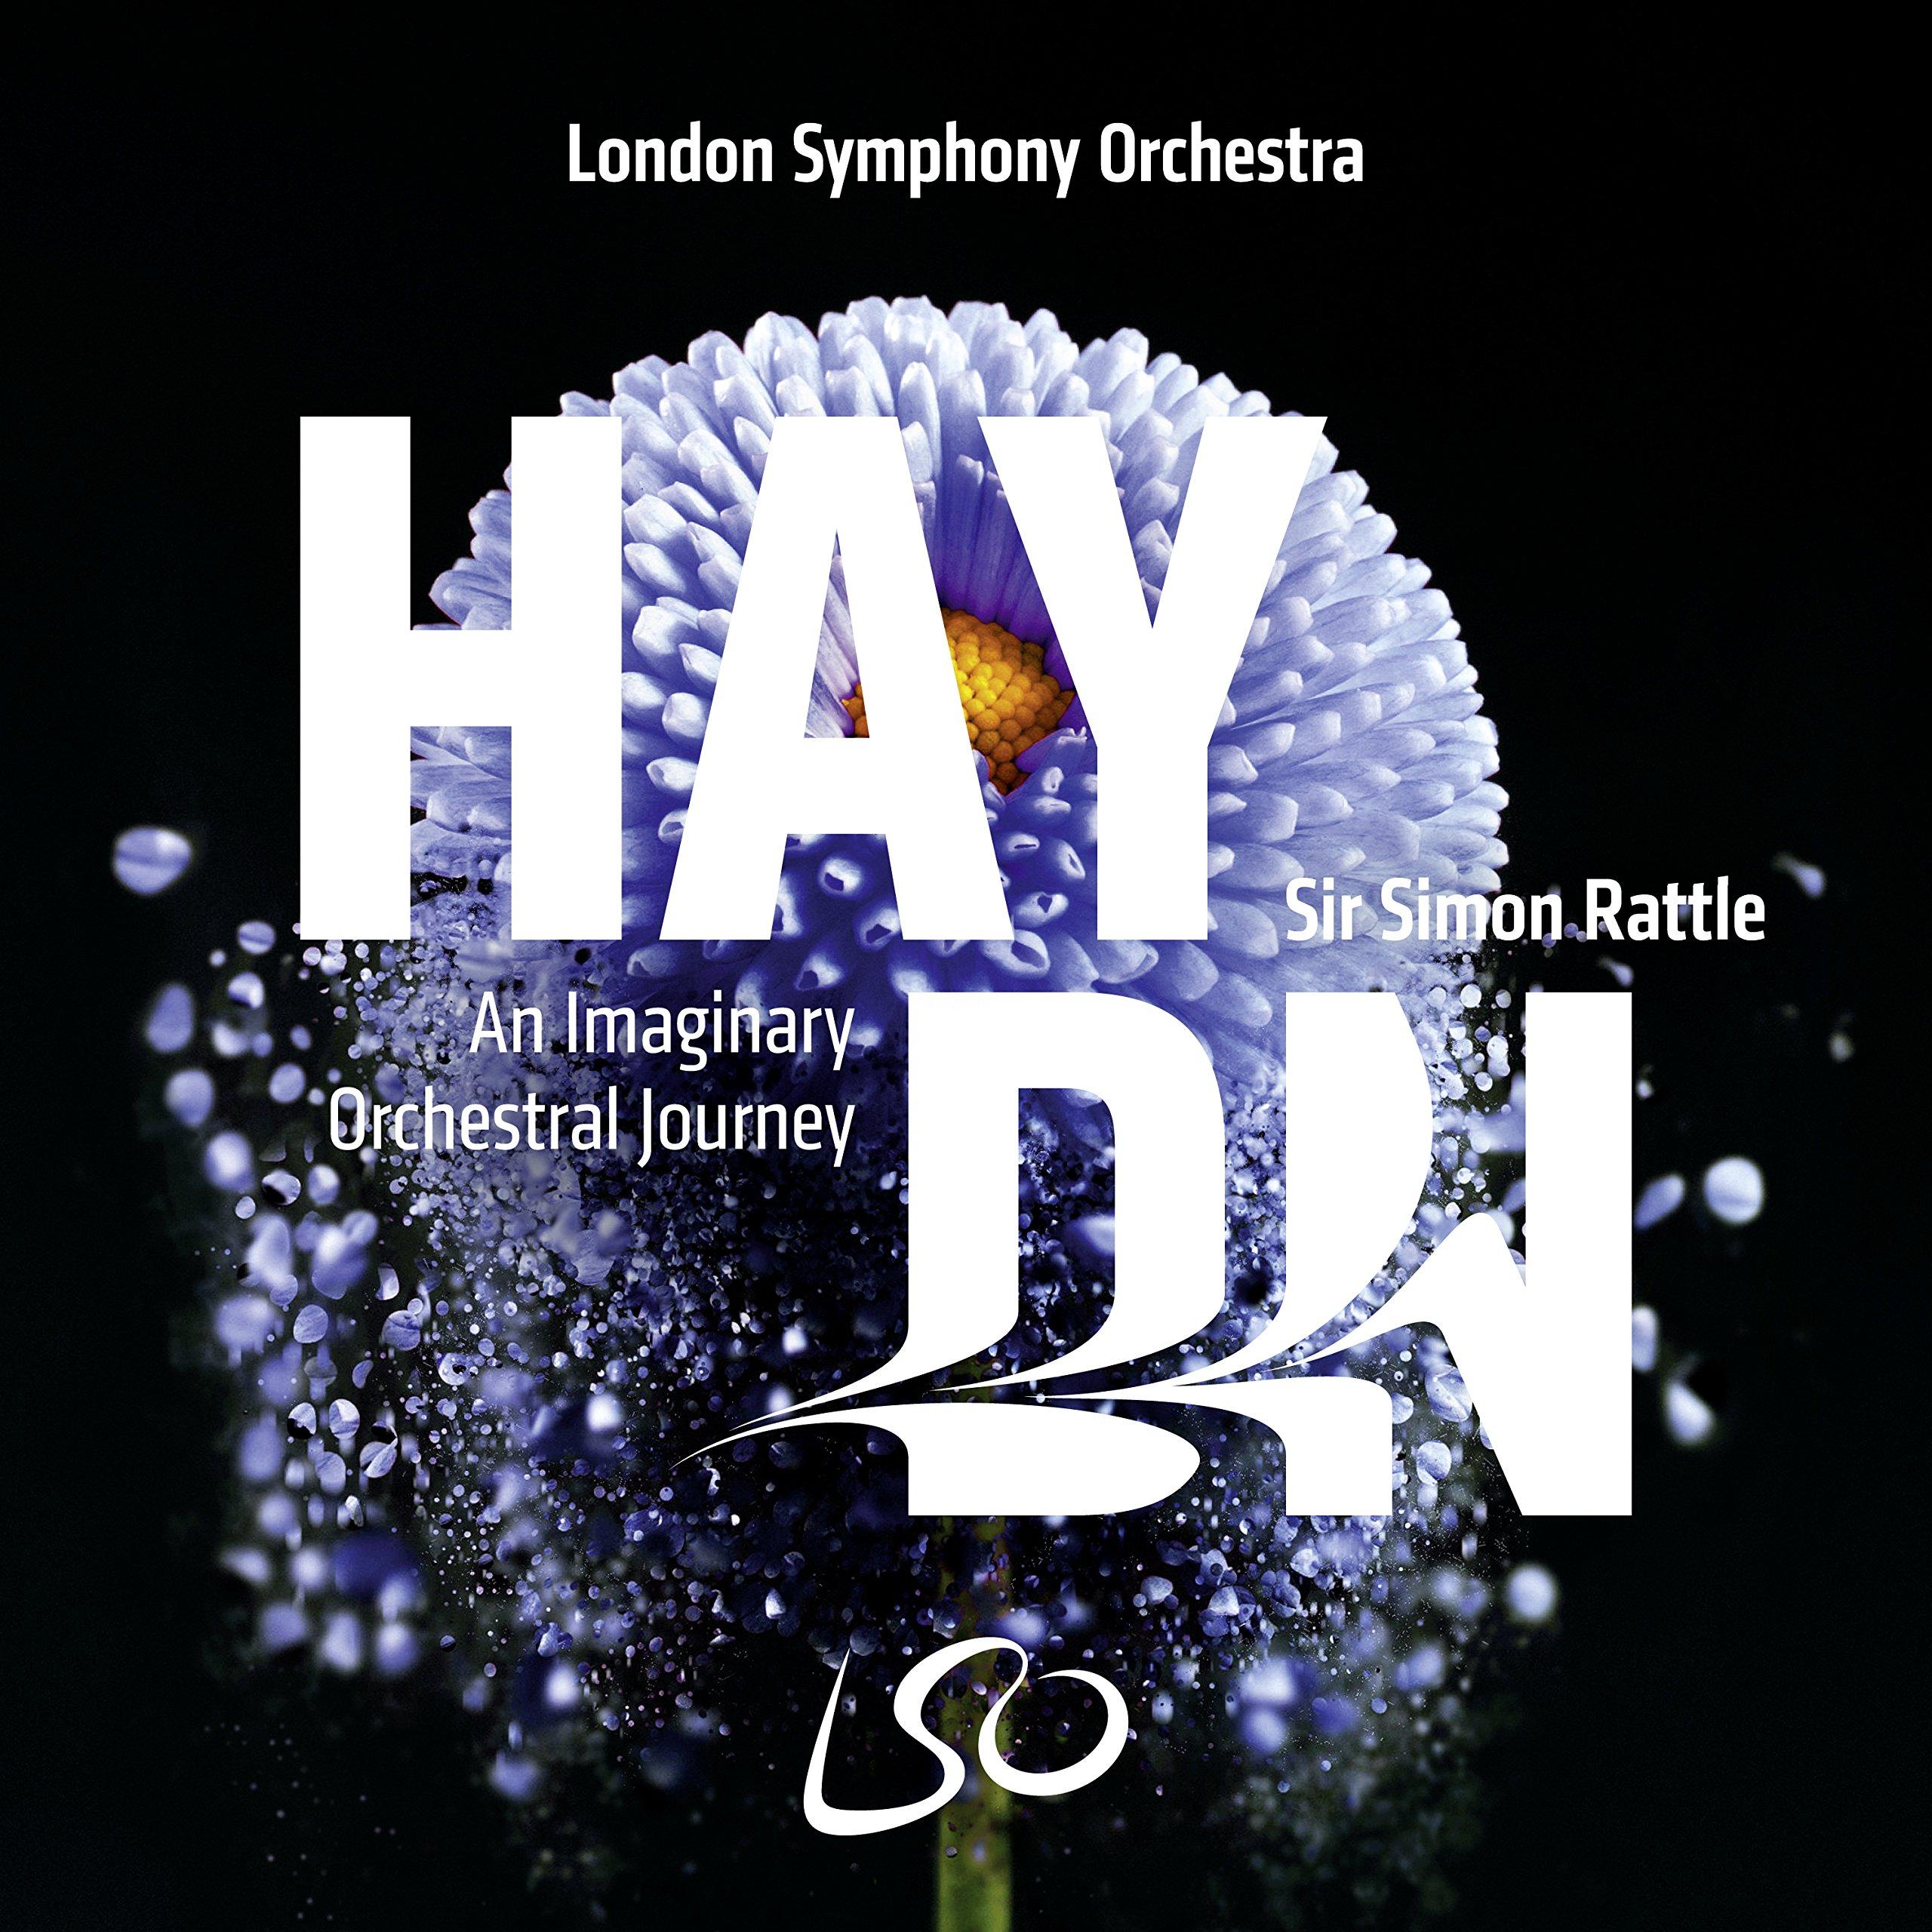 SACD : LONDON SYMPHONY ORCHESTRA - SIR SIMON RATTLE - An Imaginary Orchestral Journey (SACD)